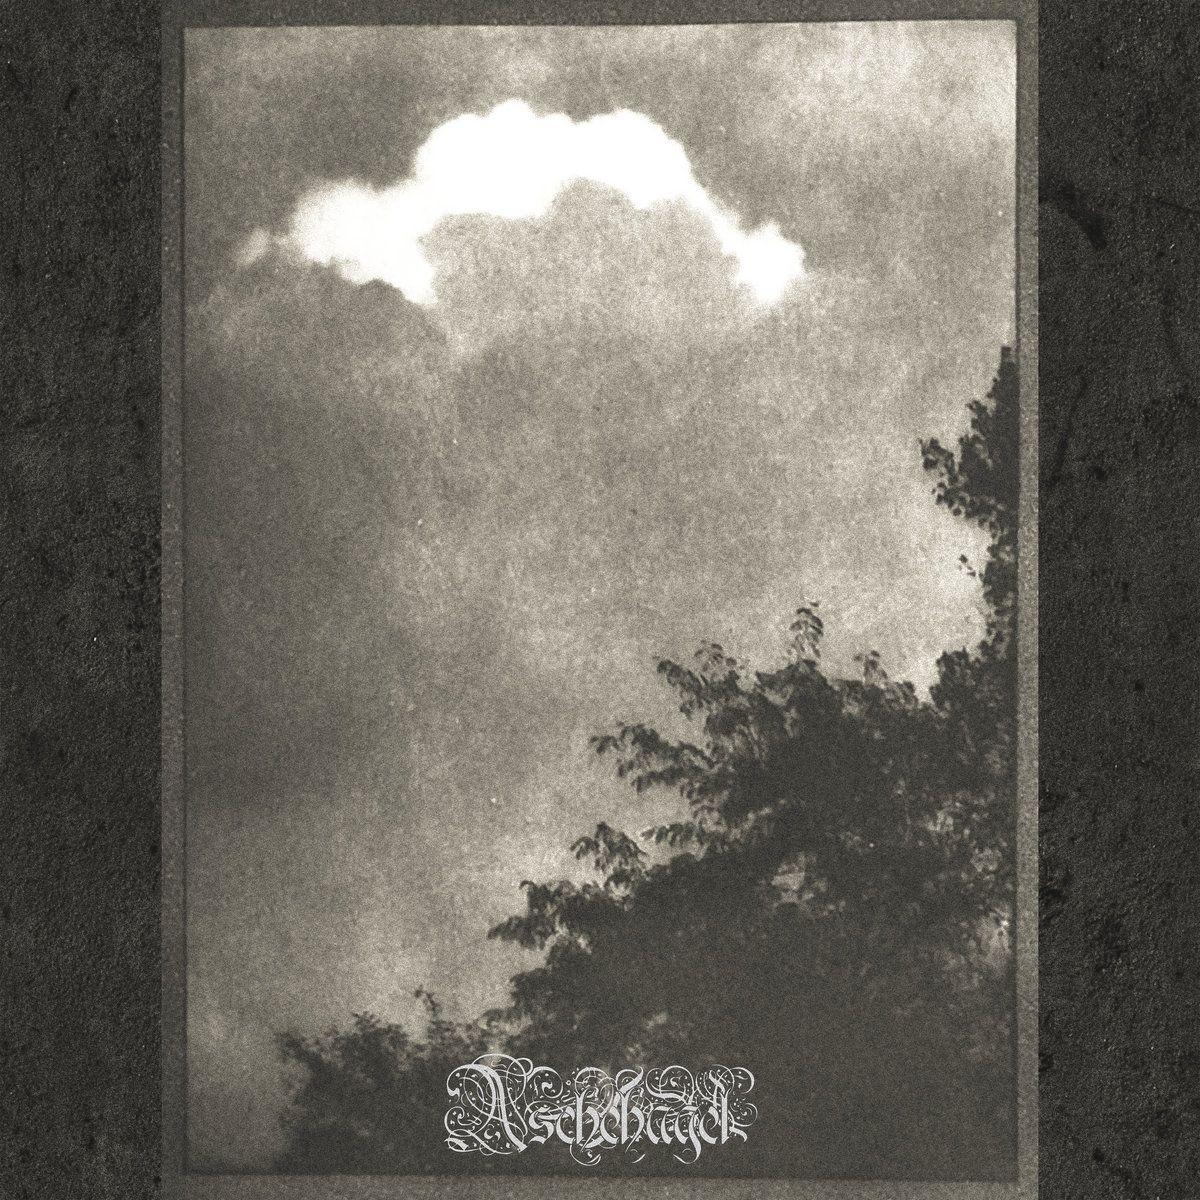 Review for Aschehagel - Gotika